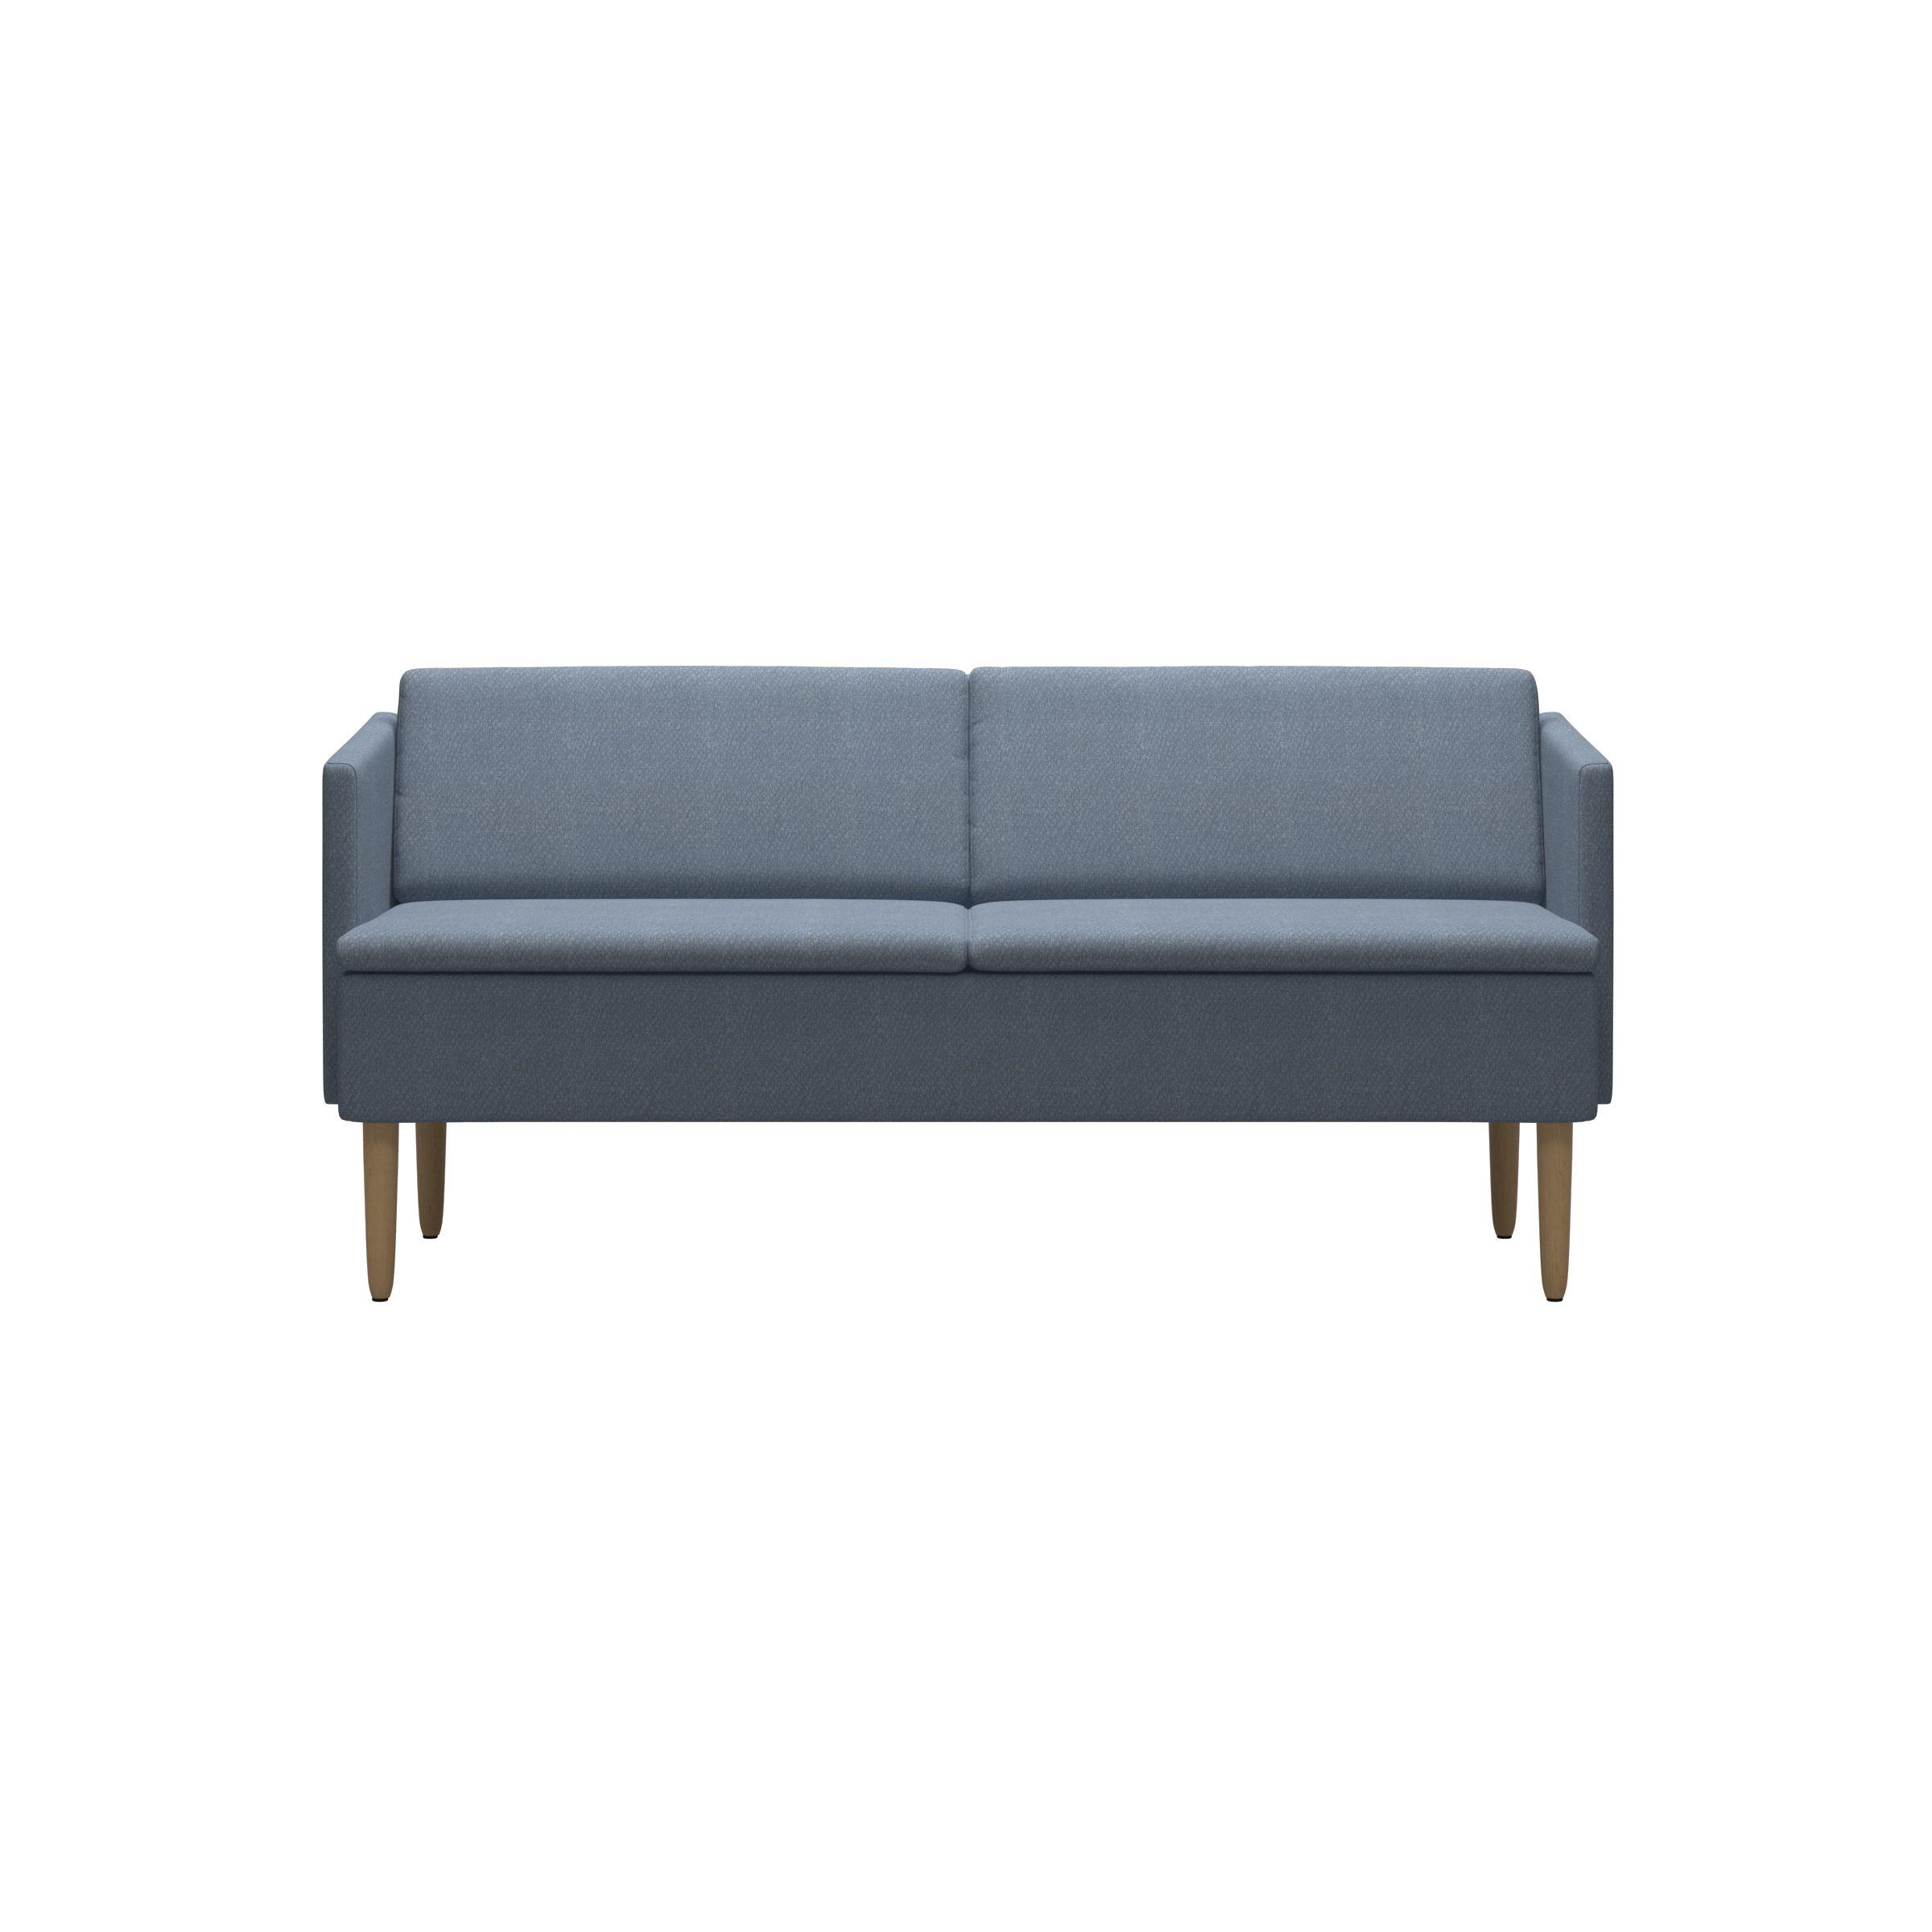 Full Size of Esszimmer Sofa Sofabank Ikea Modern Grau Couch Vintage Leder 3 Sitzer Stressless Spice Landhausstil Teilig Günstig Kaufen Alternatives Stoff Modulares Sofa Esszimmer Sofa